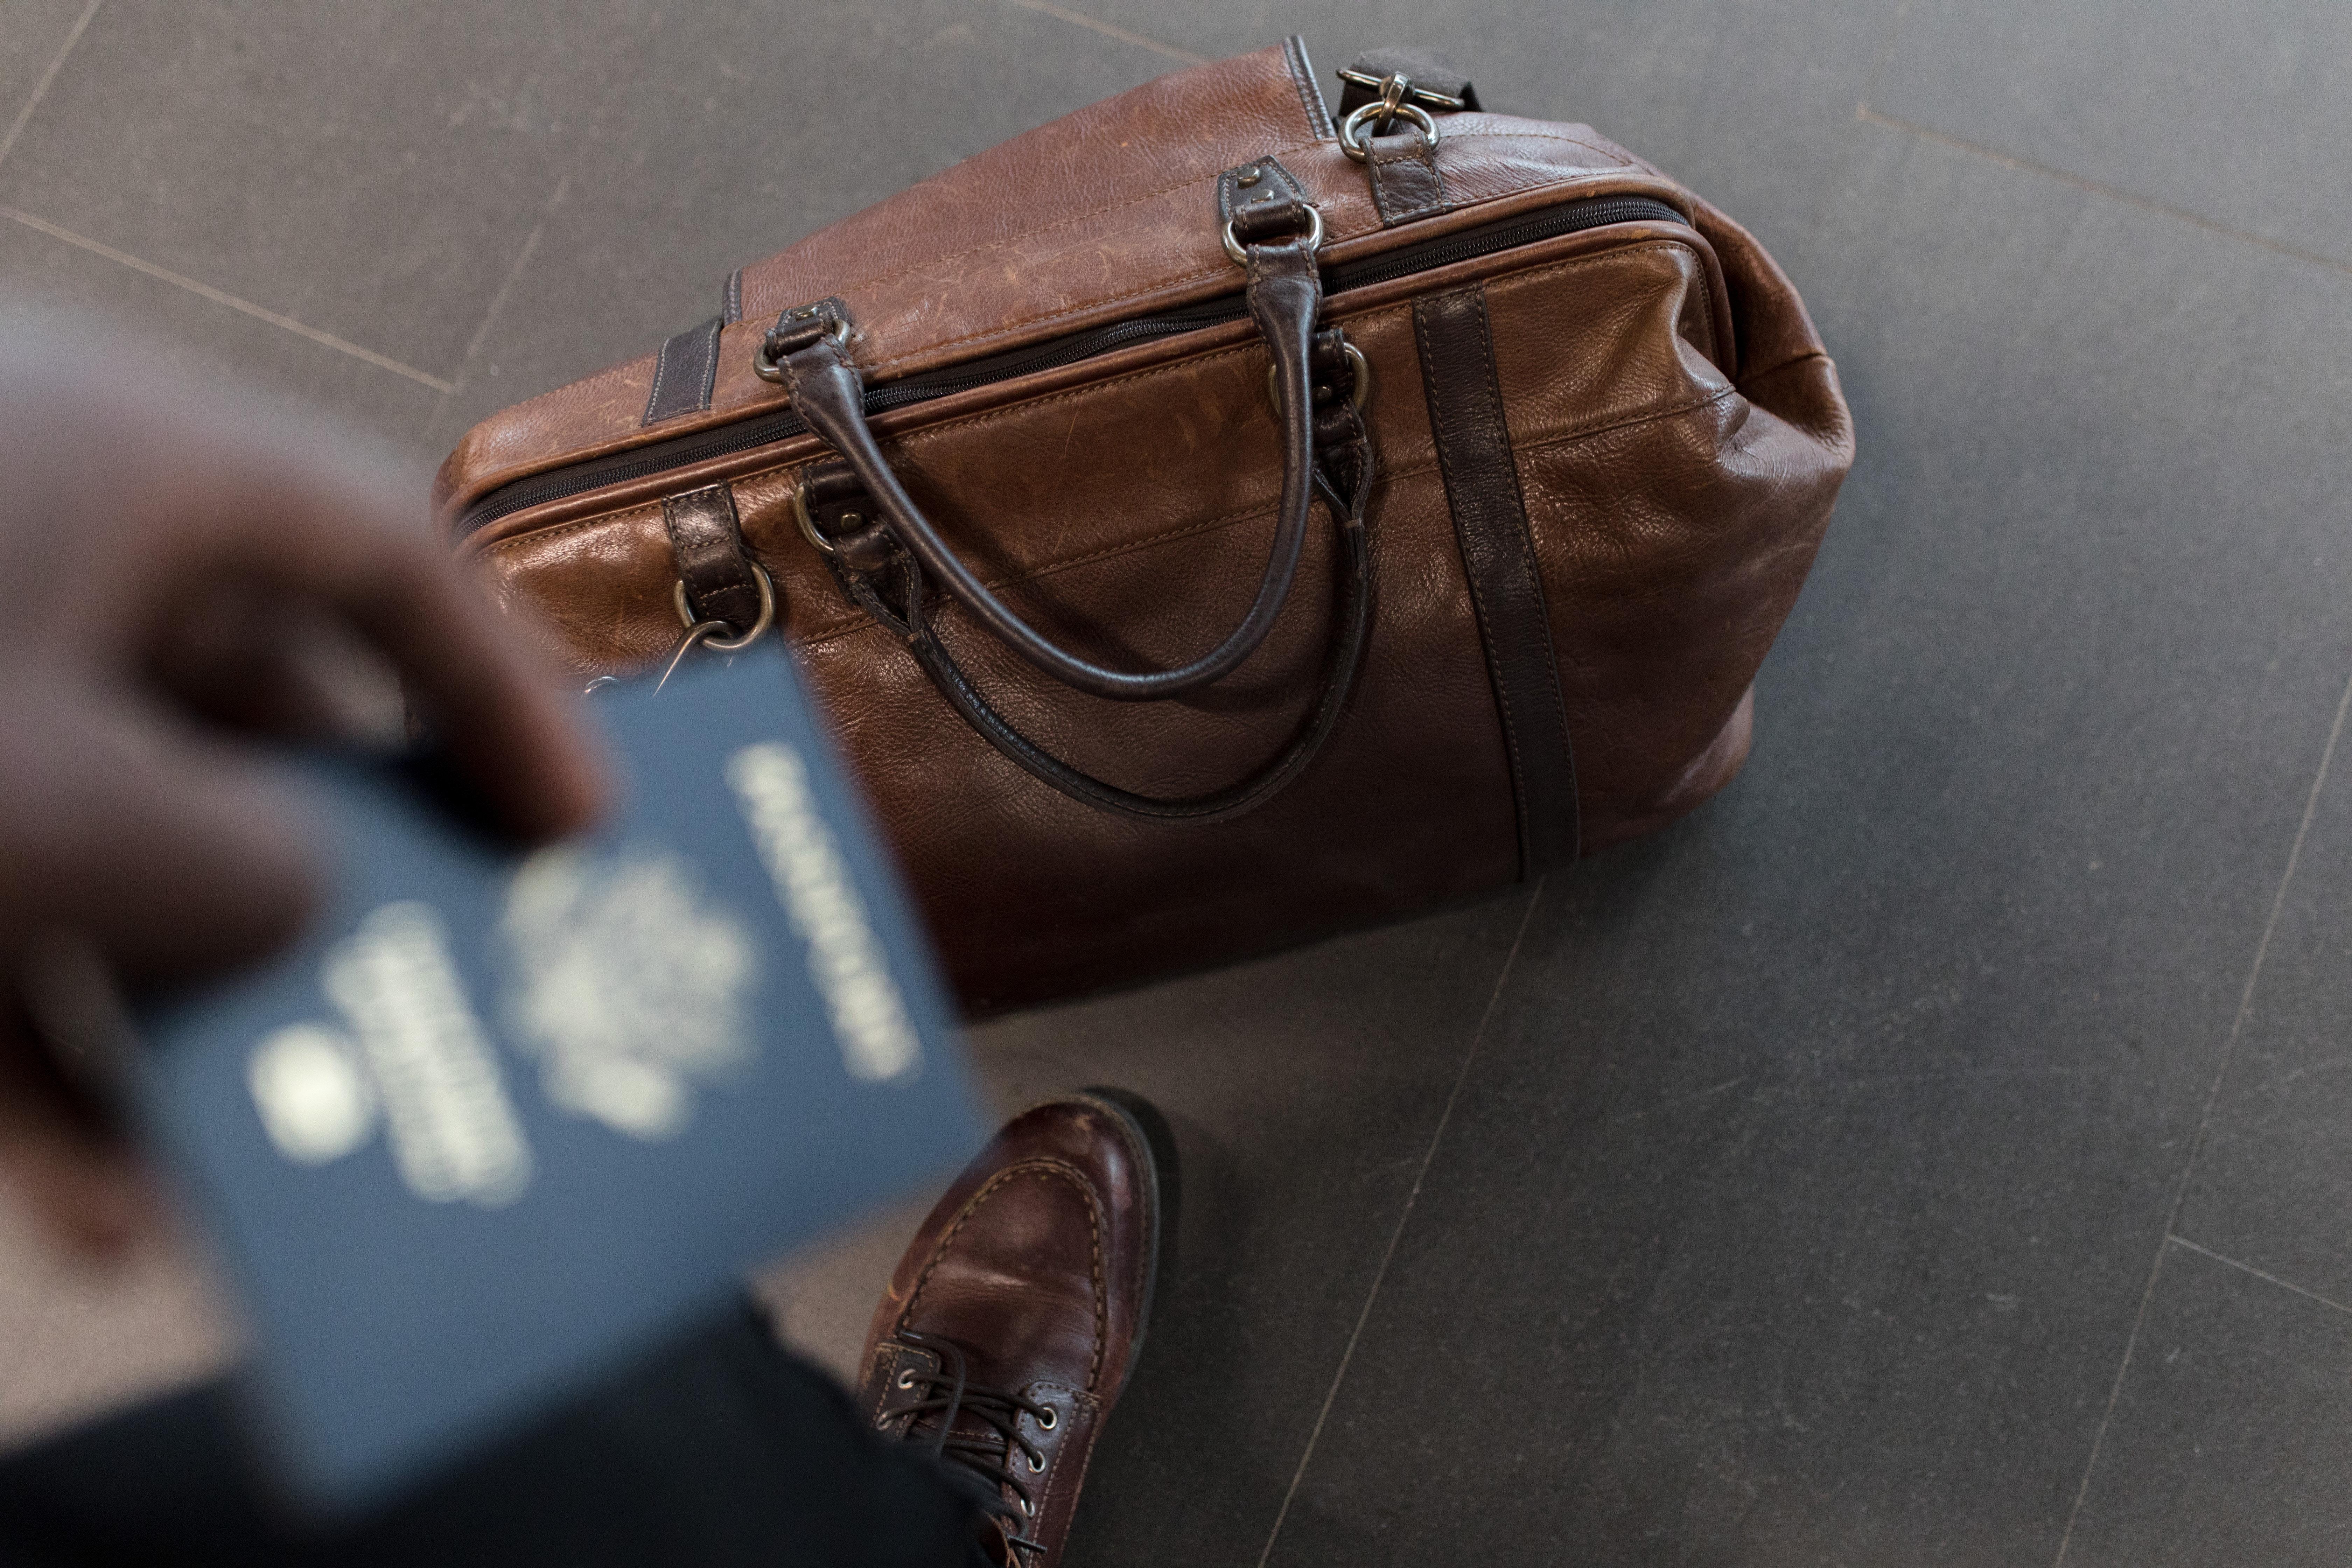 Planea tus escapadas con Booking... ¡Con un 6,00% de cashback!